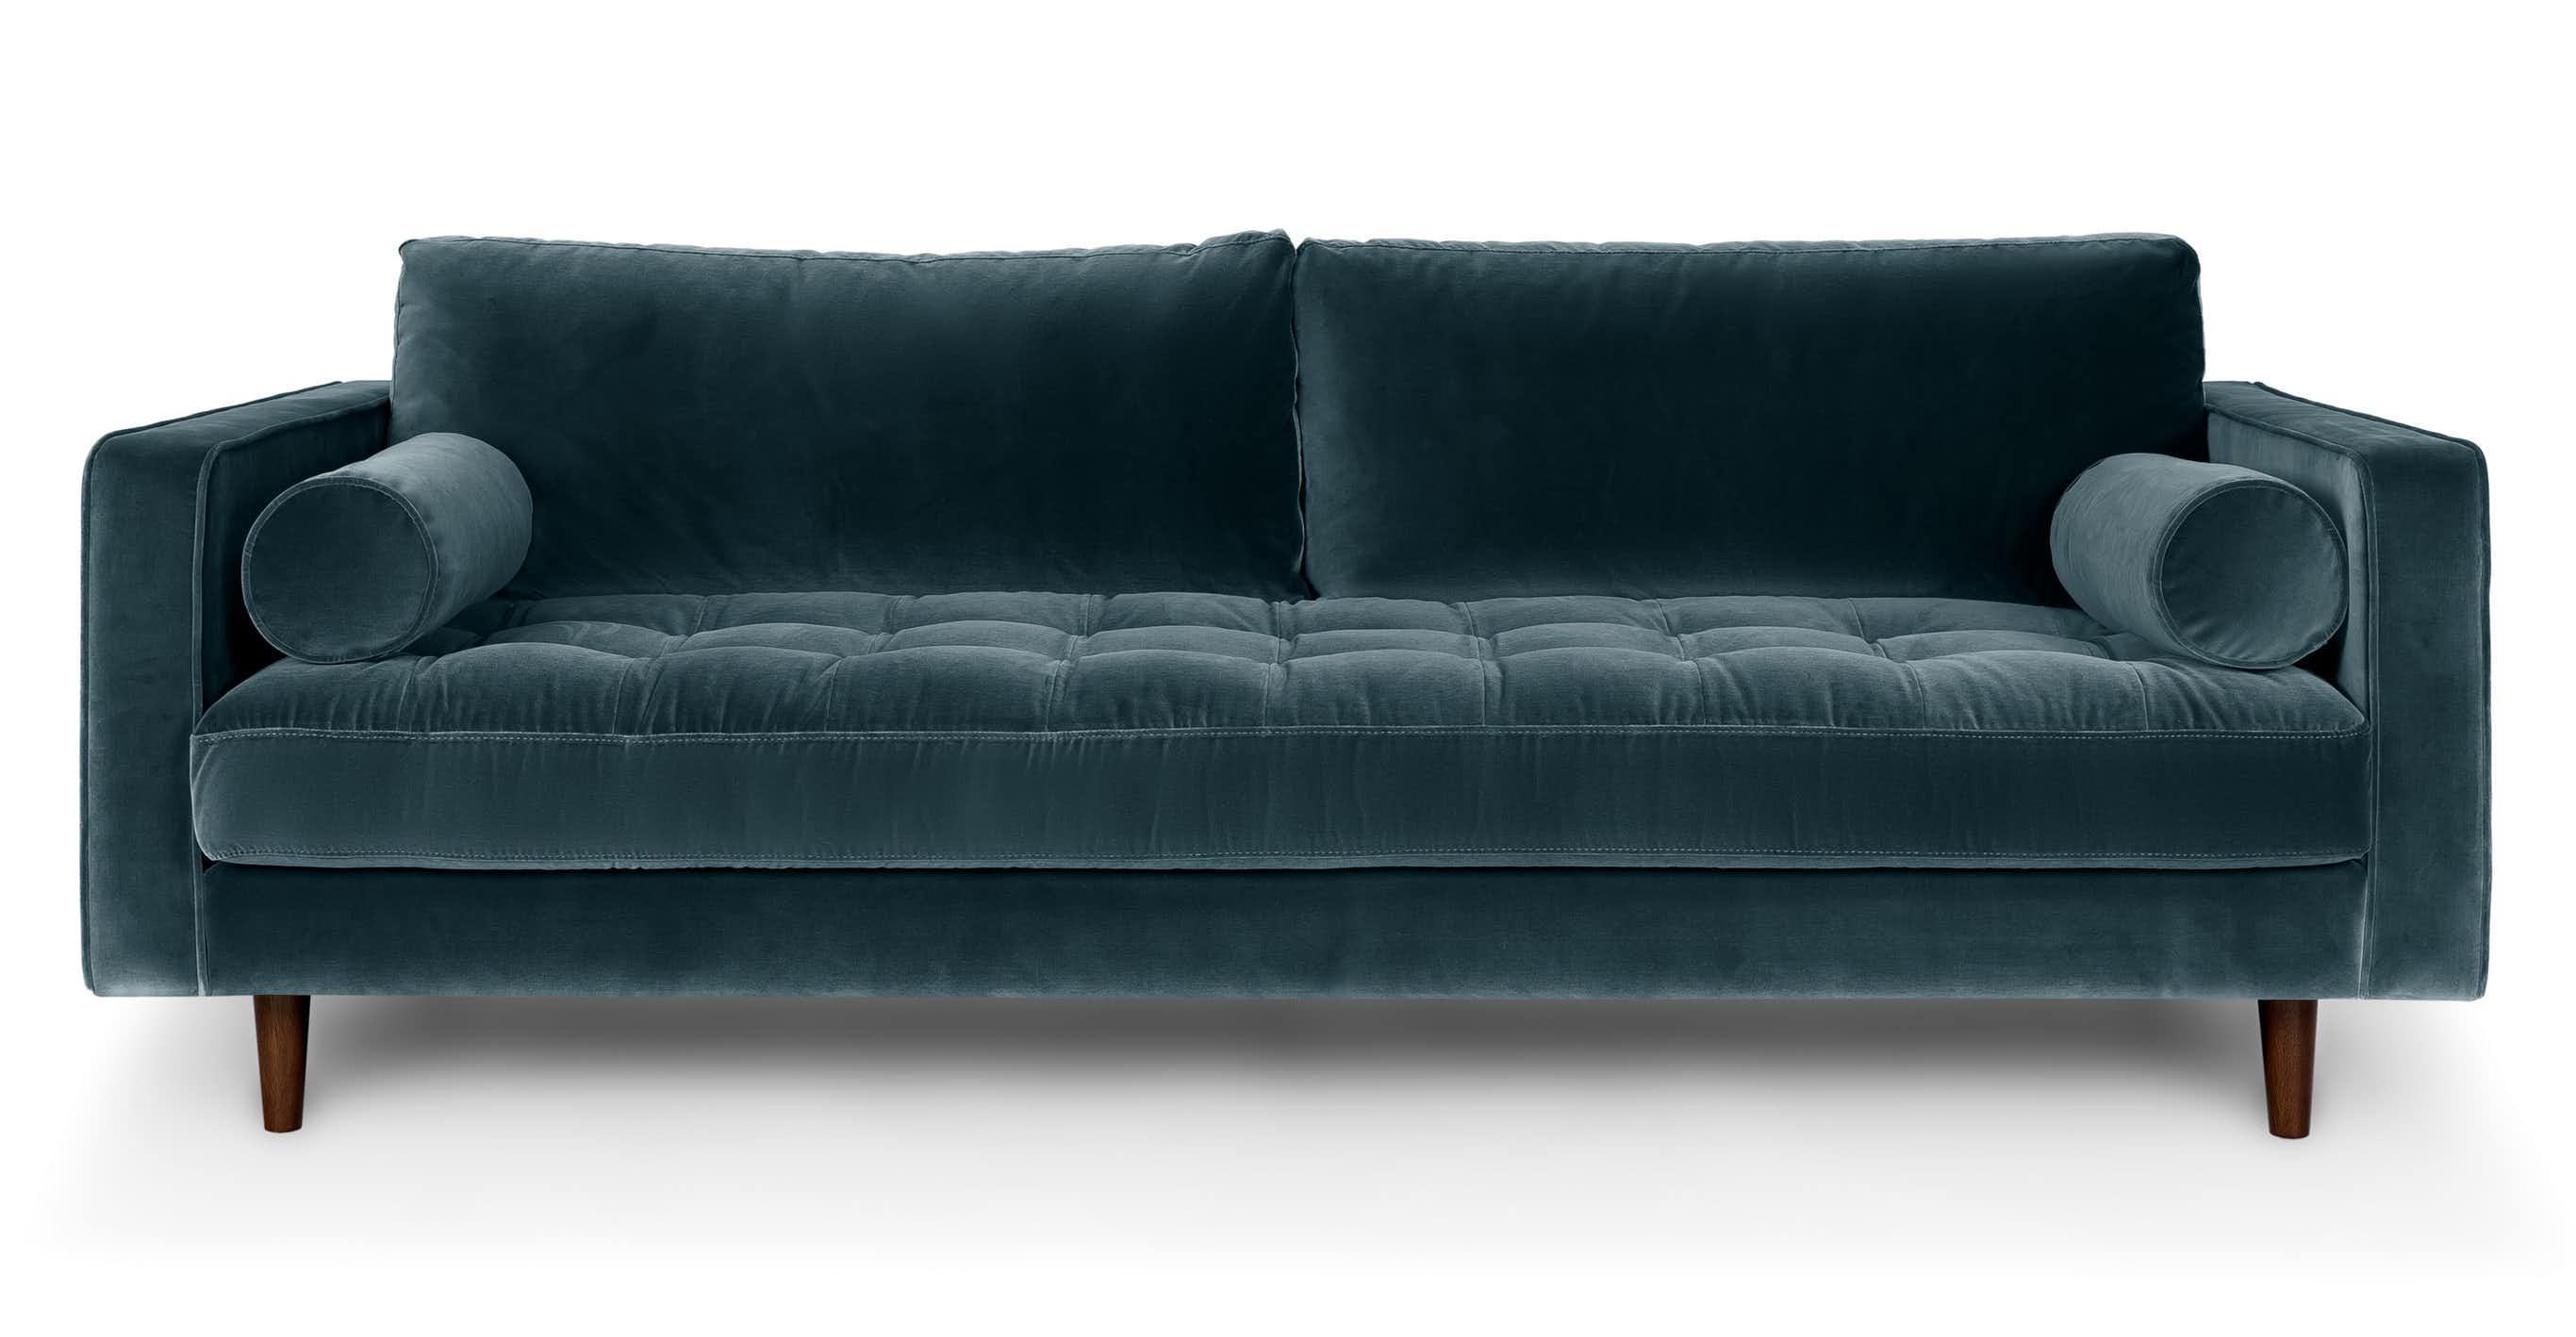 black friday sofa deals 2018 uk marge carson prices sofas